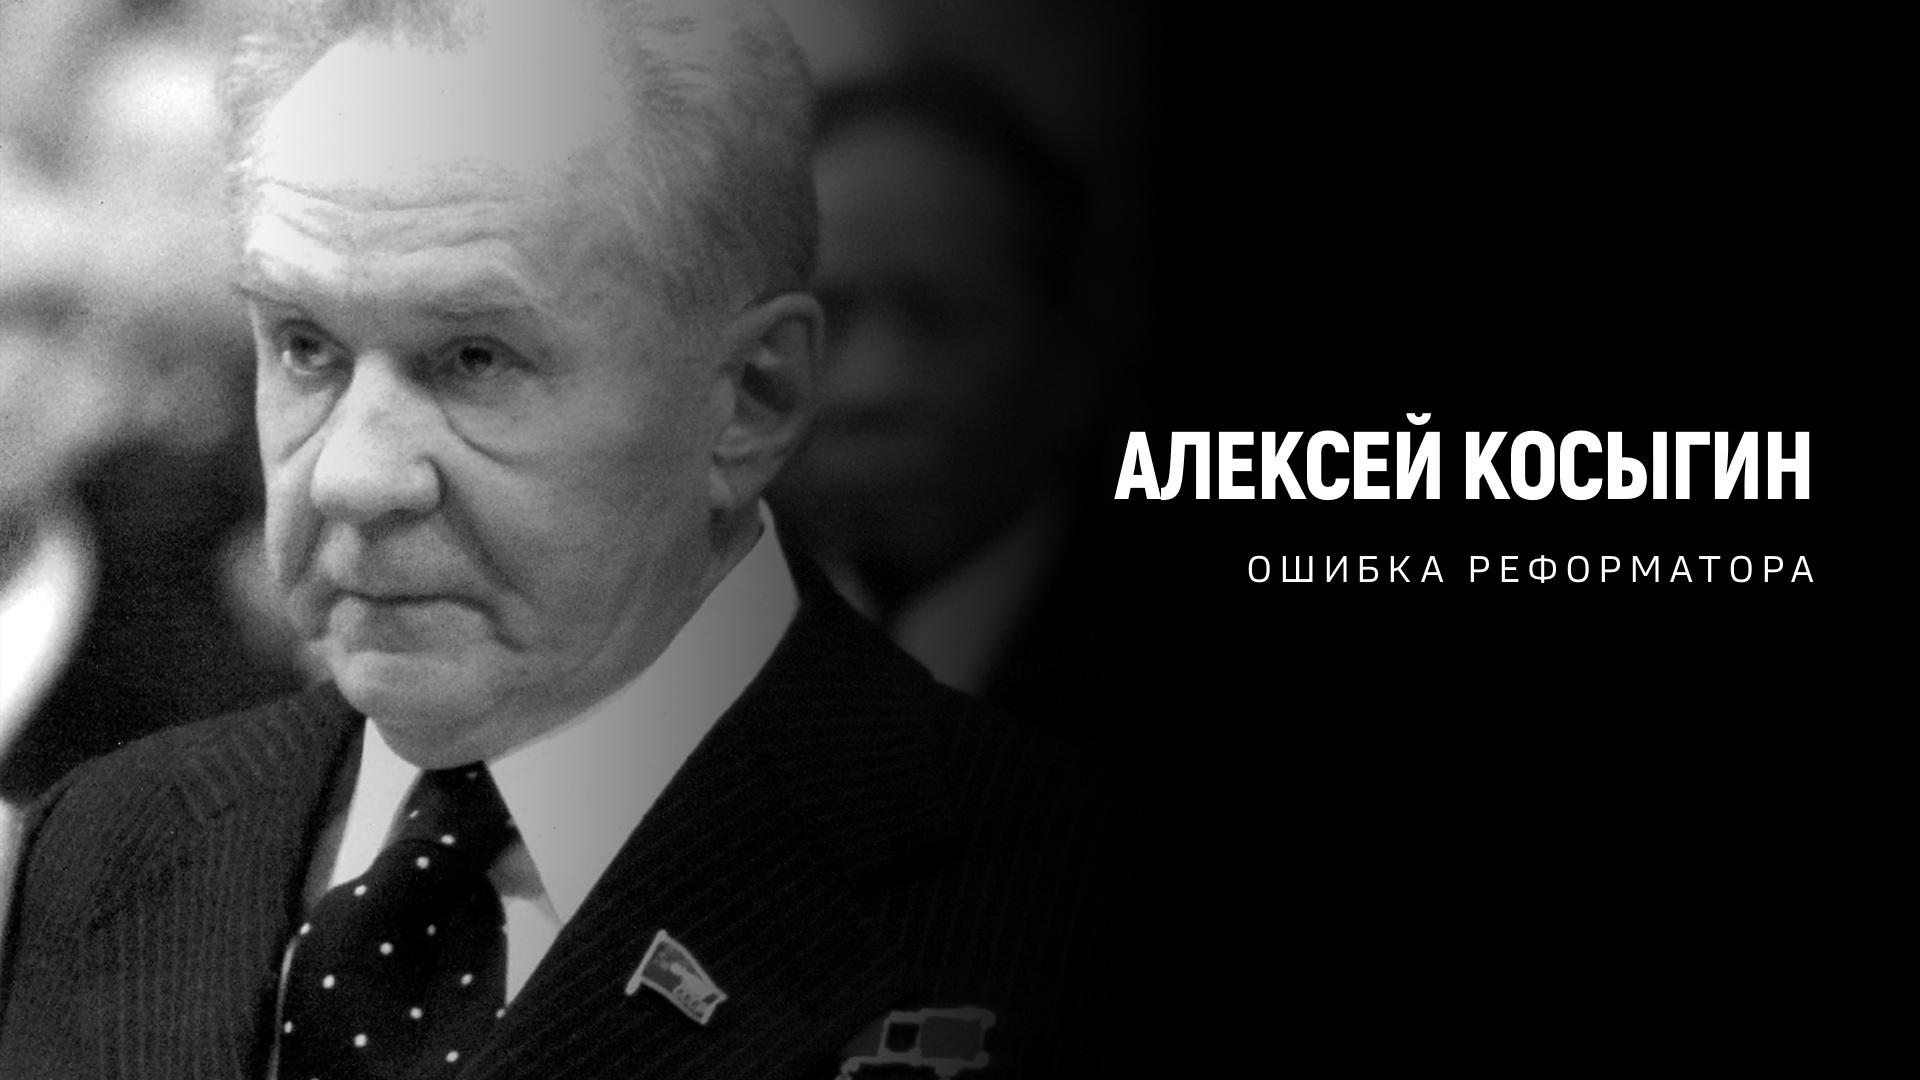 Алексей Косыгин. Ошибка реформатора